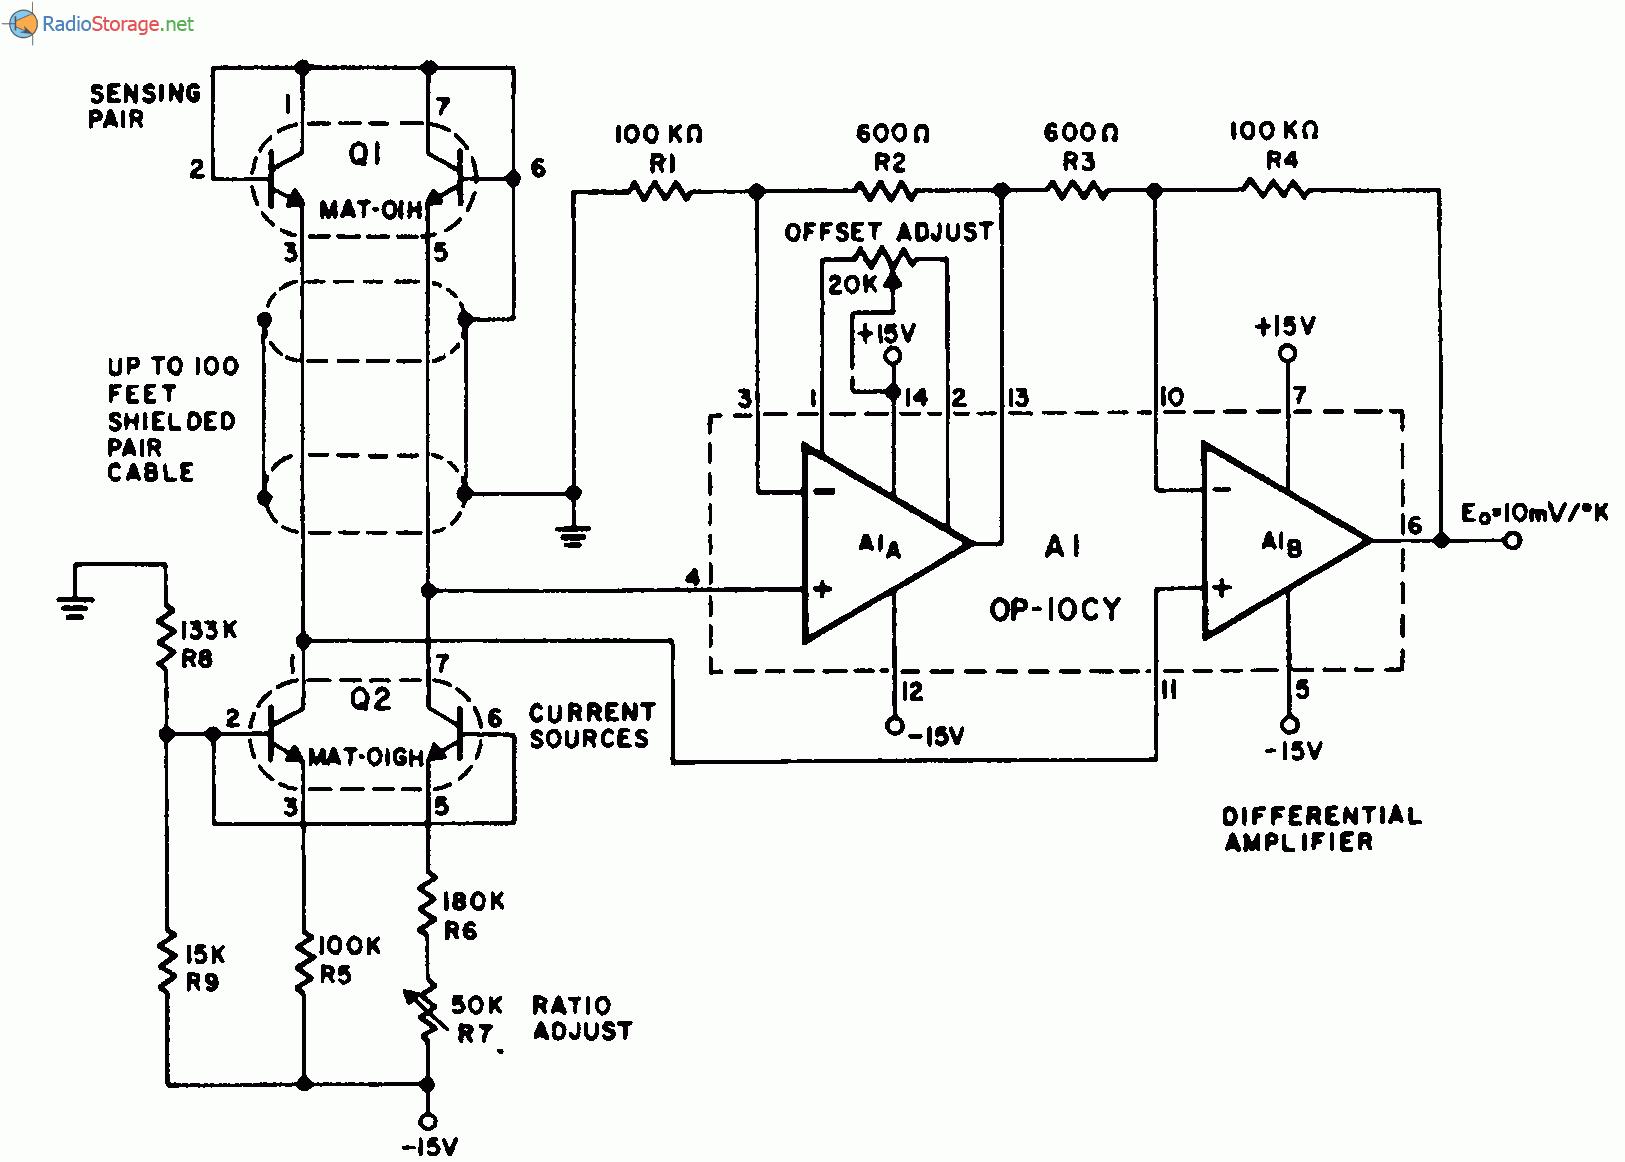 ...схеме симметричная пара транзисторов QI типа МАТ-01Н компании Precision Monolithics измеряет температуру...